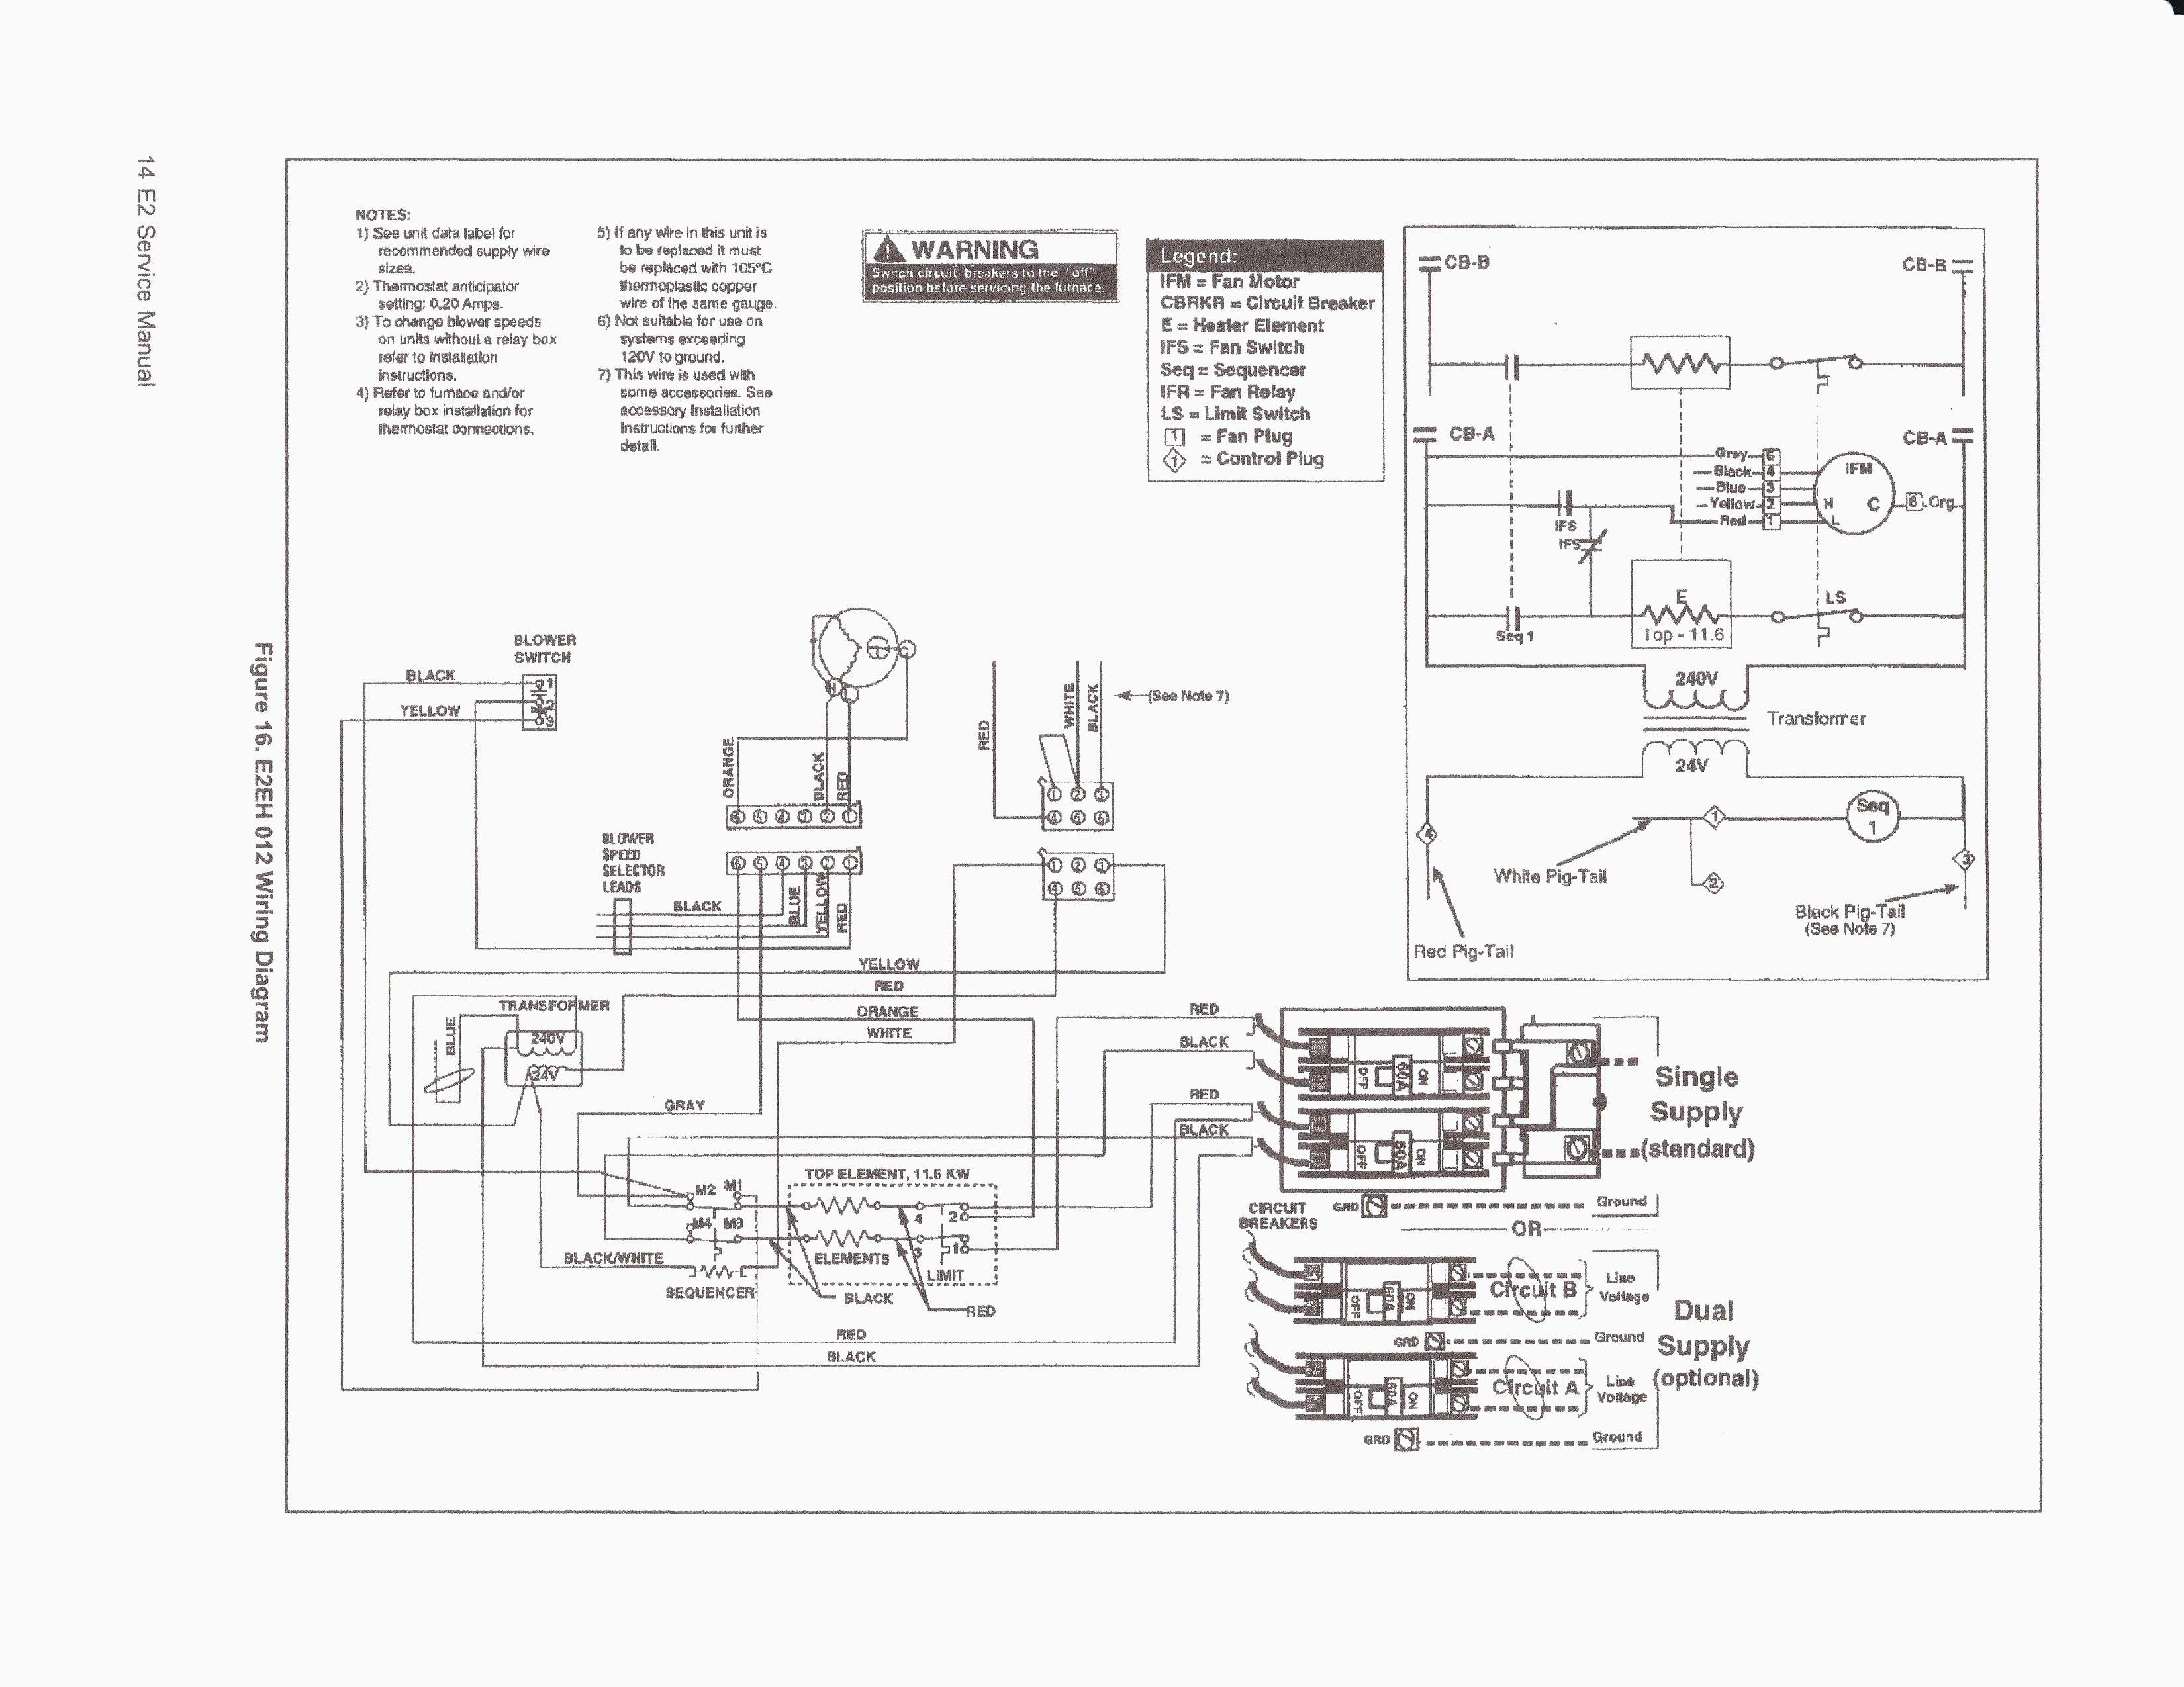 Unique Westinghouse Electric Furnace Wiring Diagram